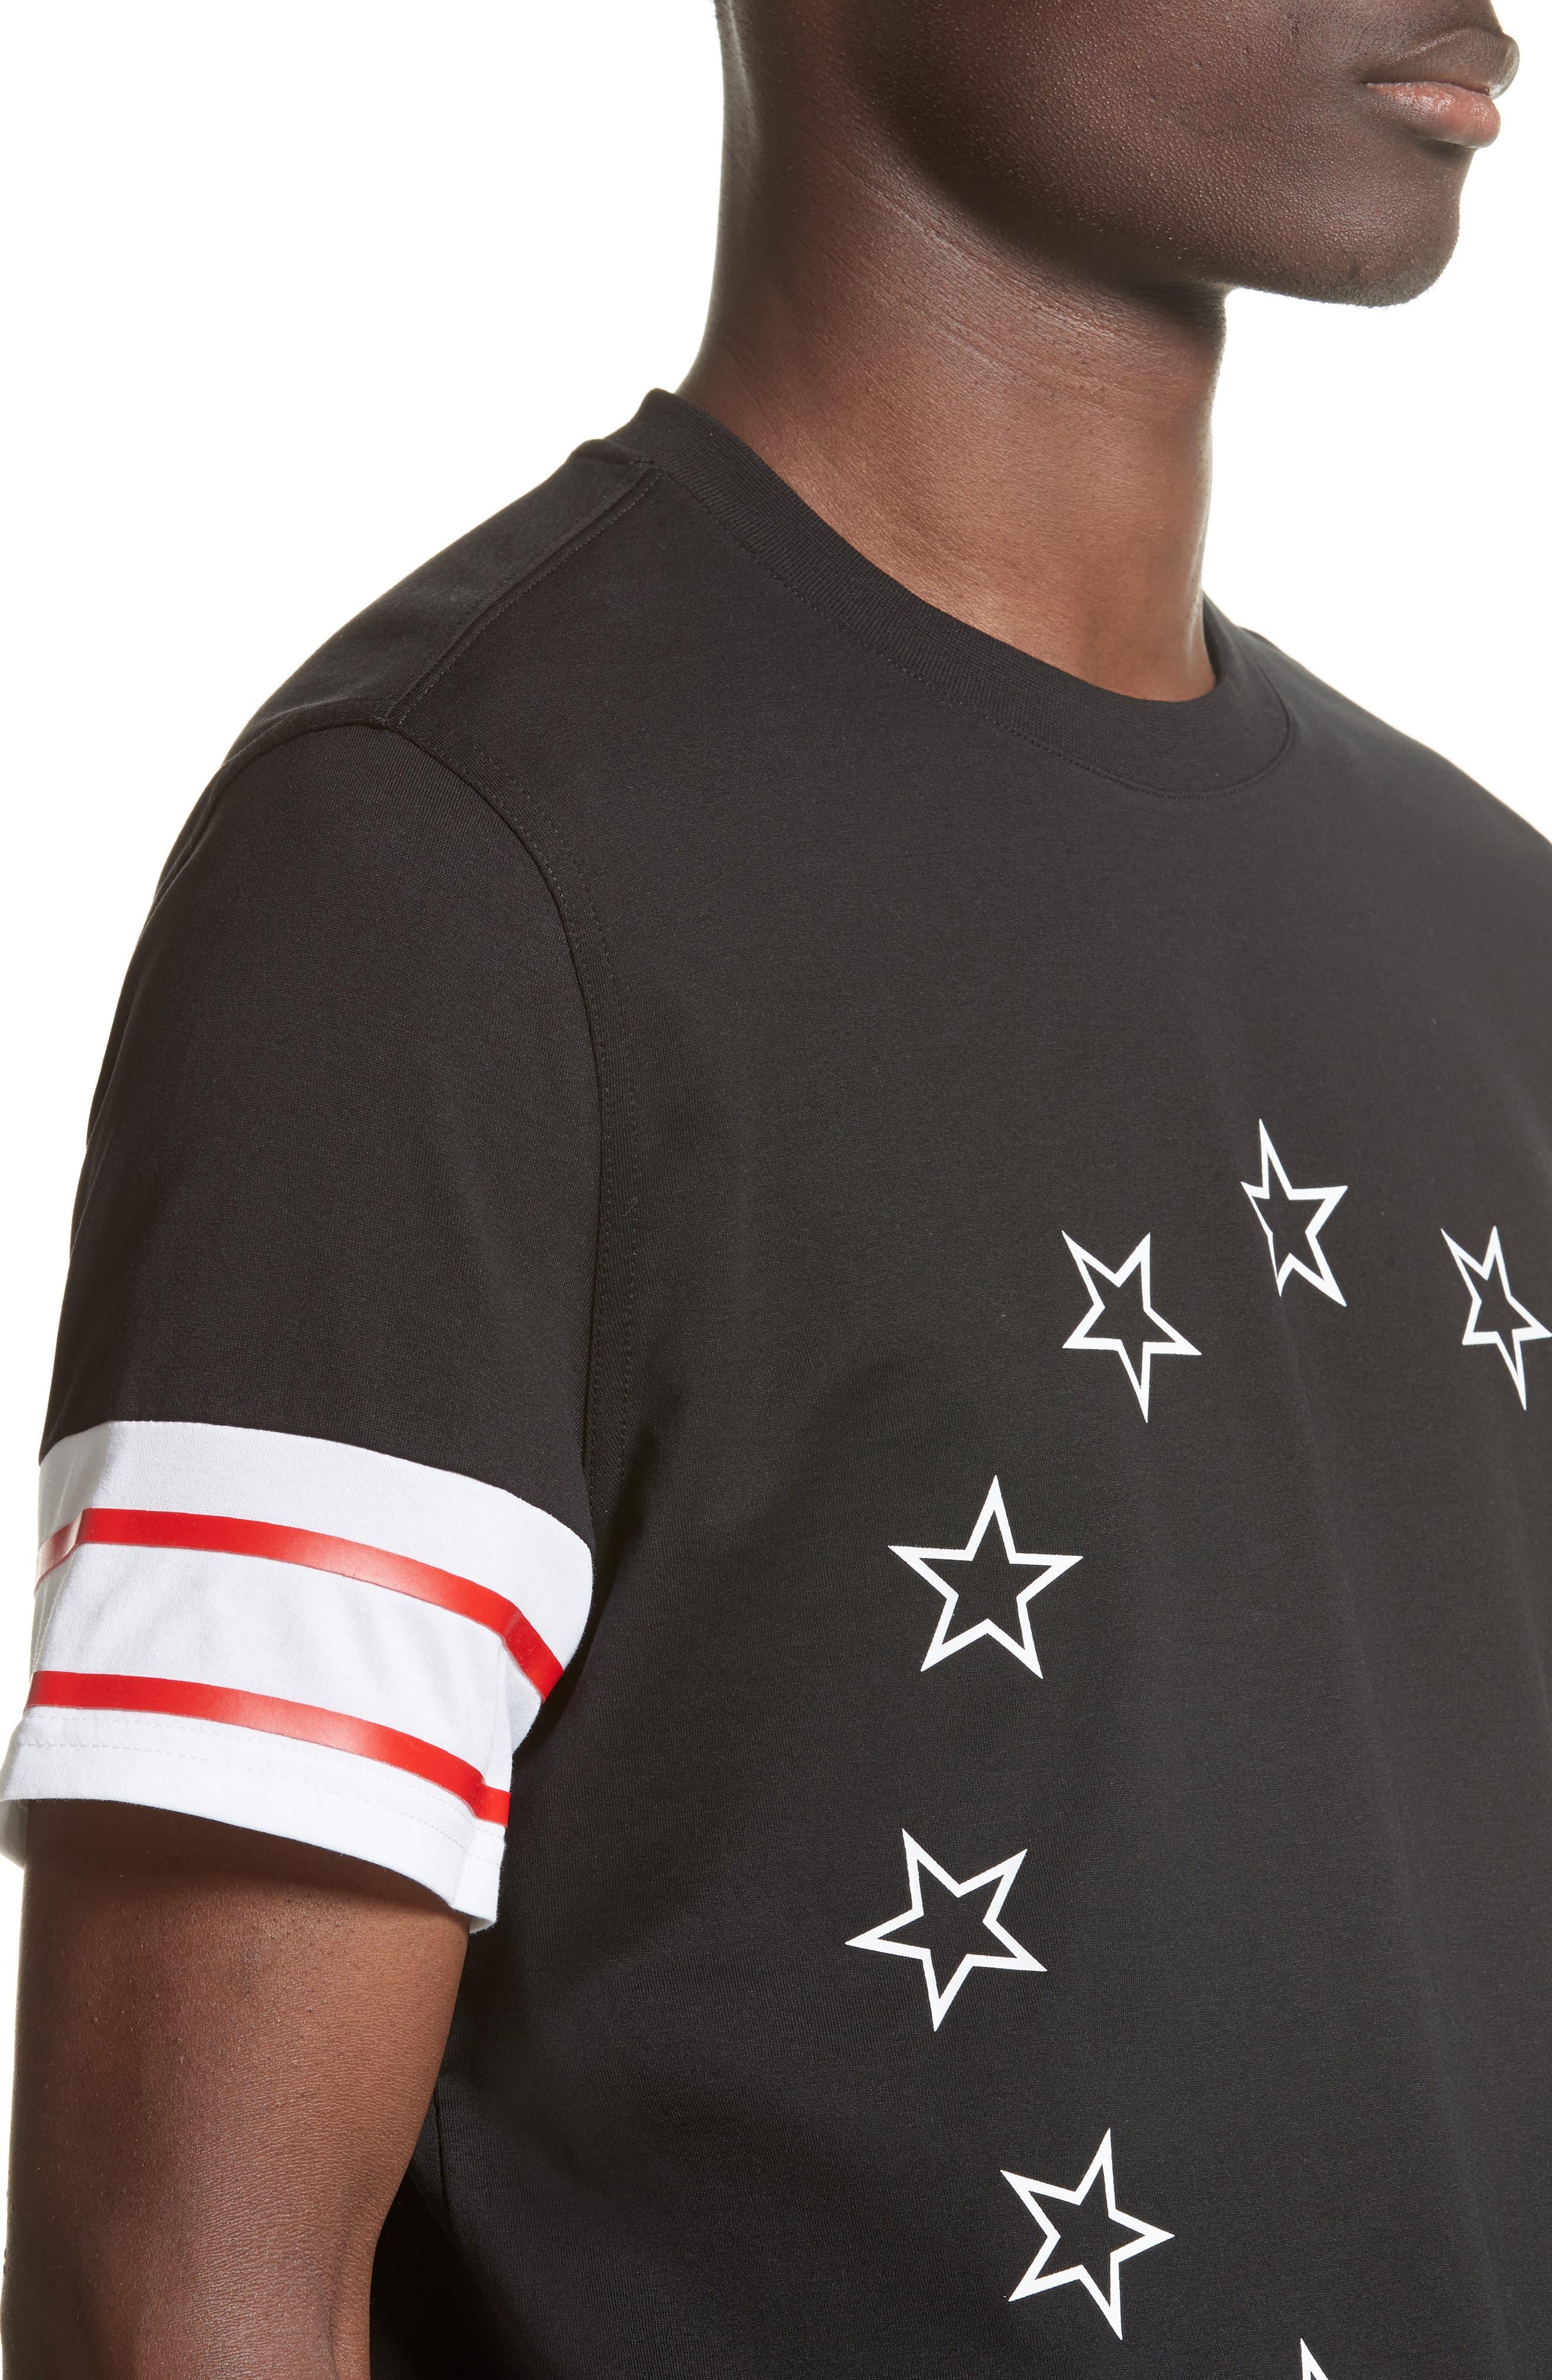 Cuban Fit Circle Star Graphic T-Shirt,                             Alternate thumbnail 4, color,                             001